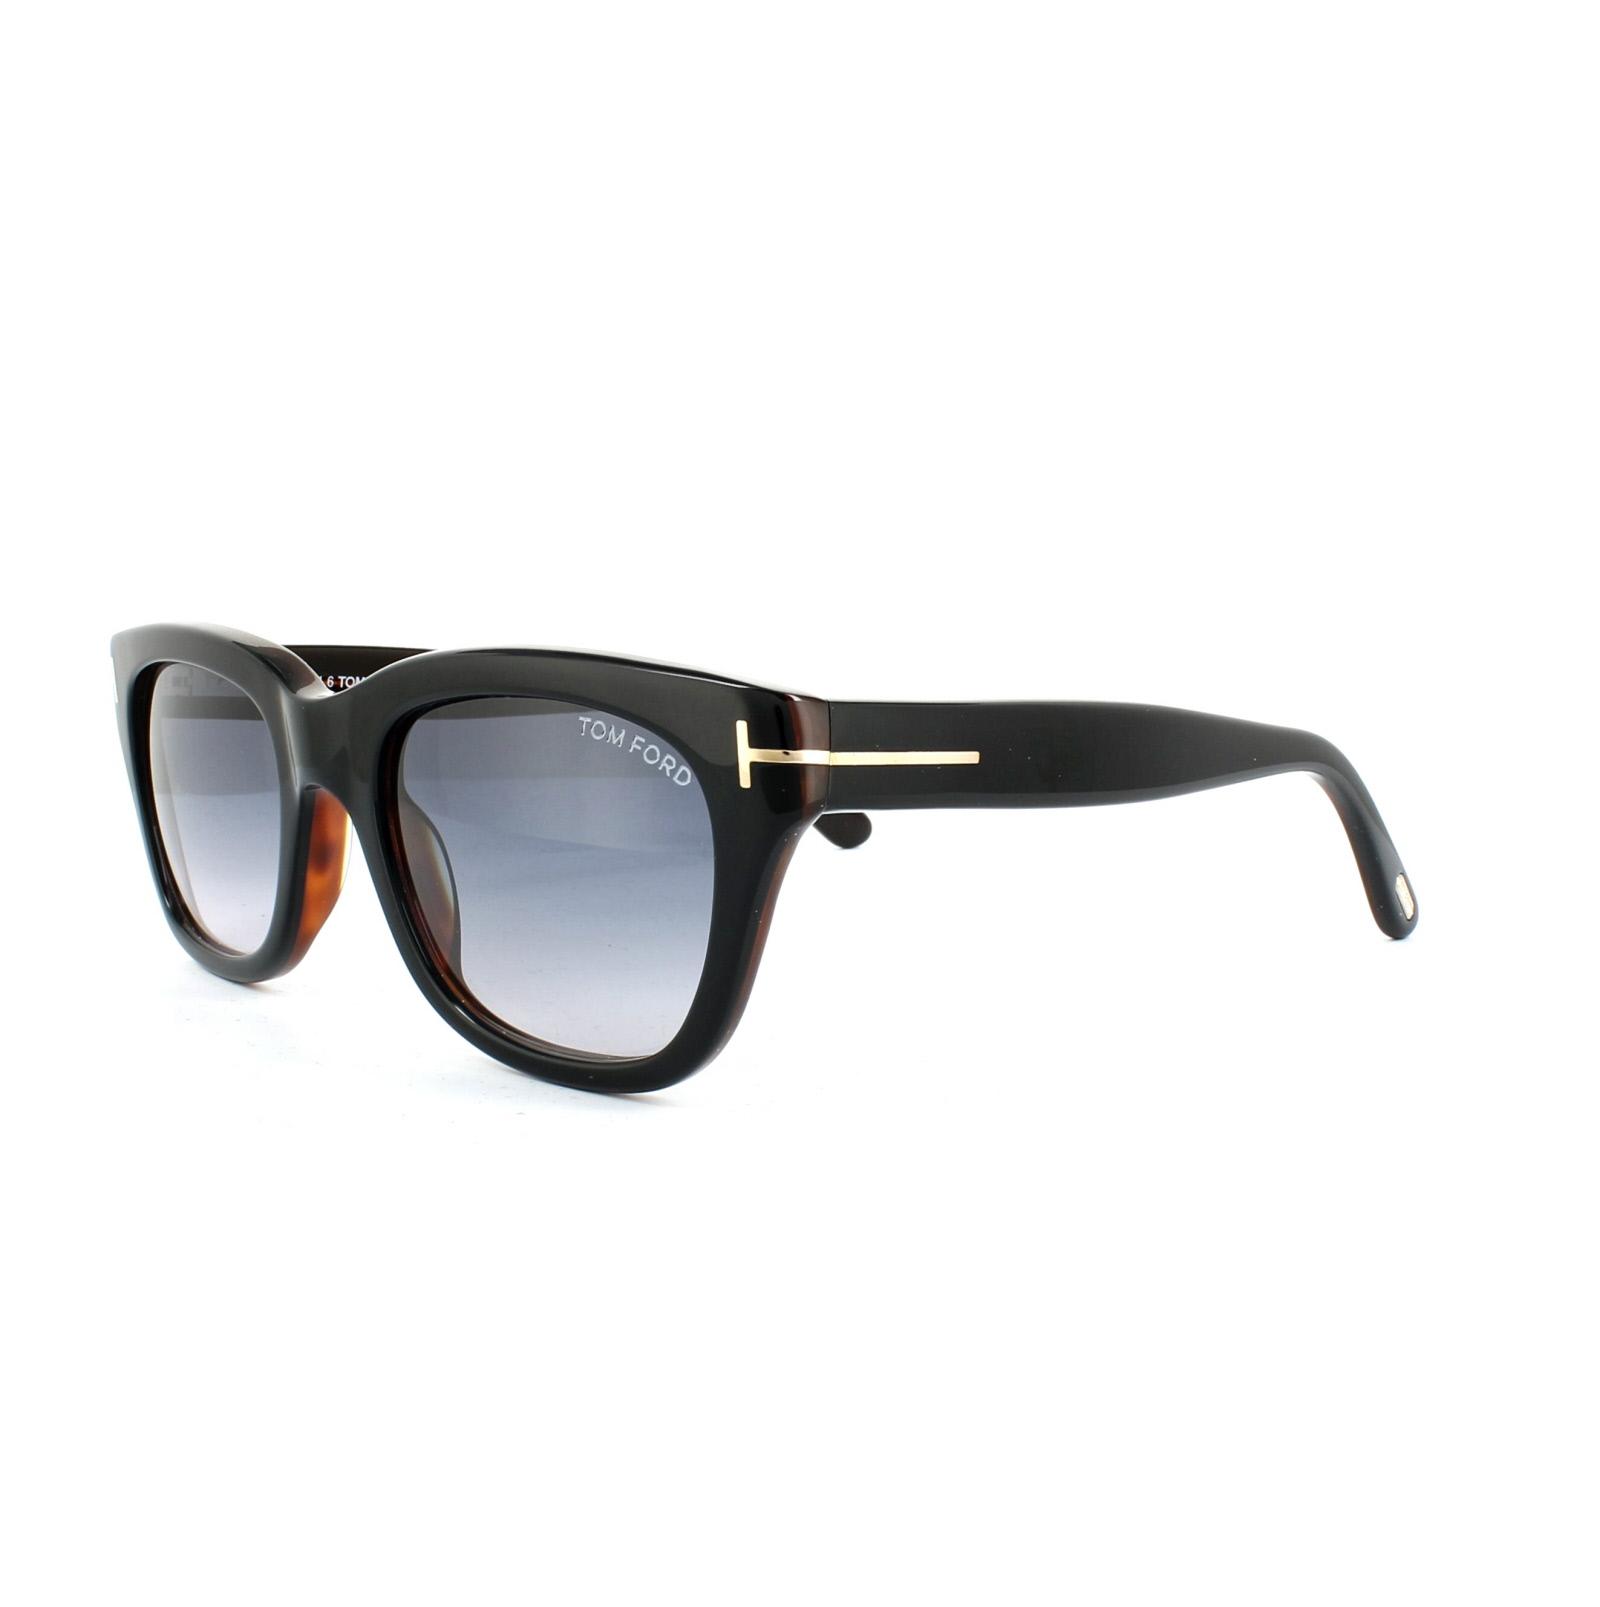 b39814d66e Sentinel Tom Ford Sunglasses 0237 Snowdon 05B Black   Brown Smoke Grey  Gradient